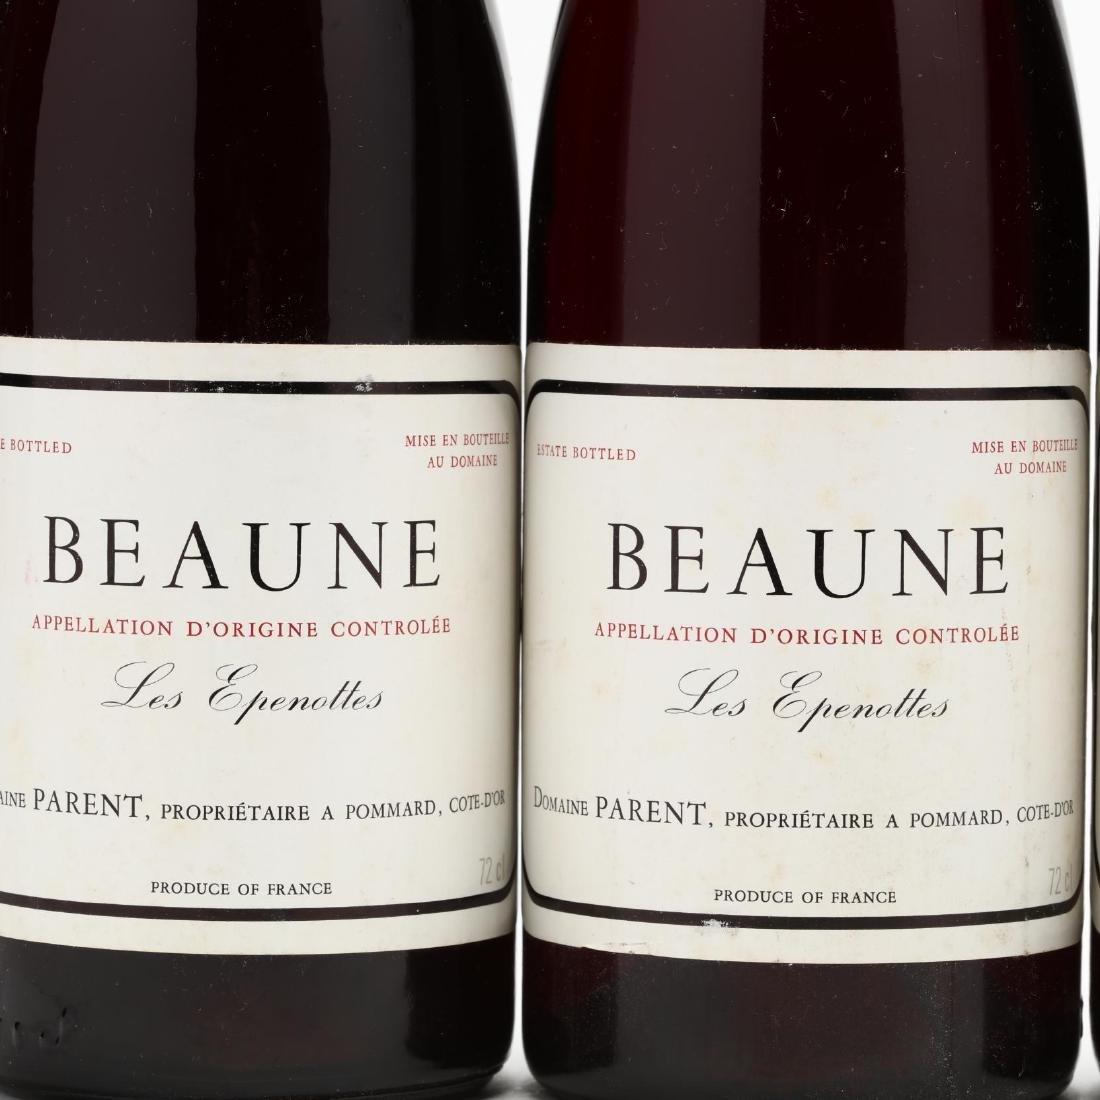 Beaune - Vintage 1978 - 2